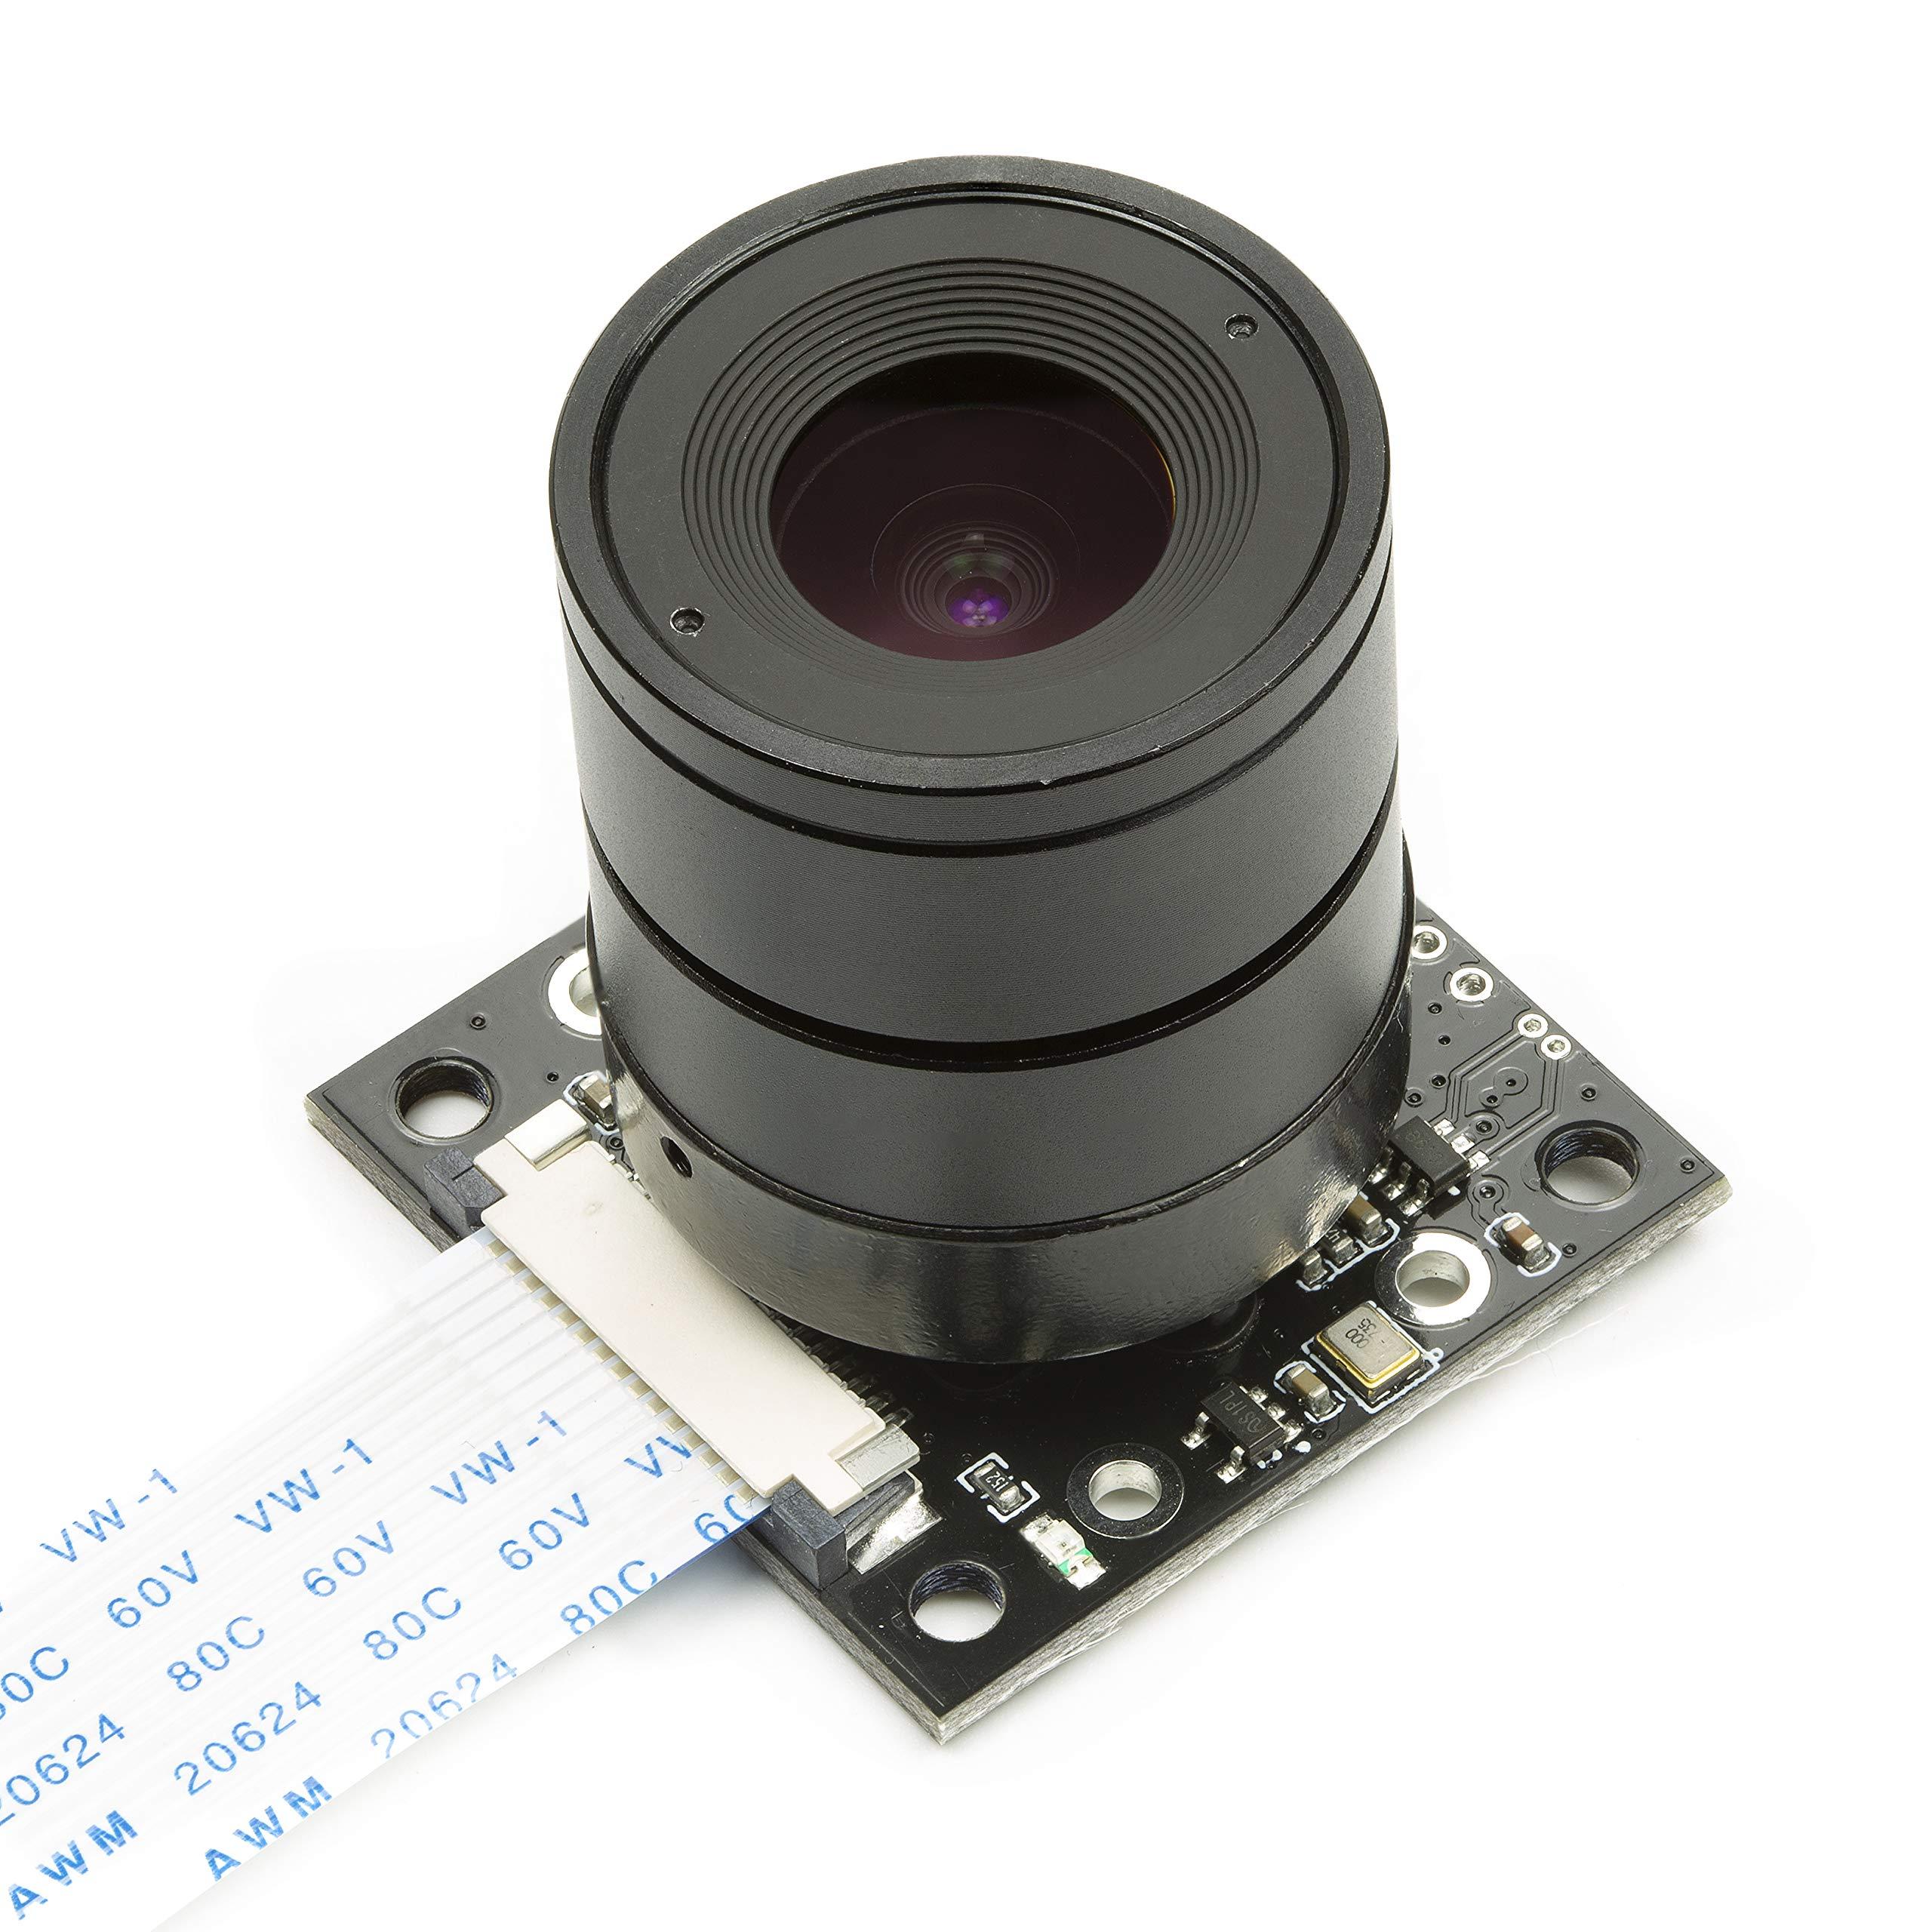 Arducam Noir Camera for Raspberry Pi, Interchangeable CS Mount Lens  LS-2717CS, OV5647 5MP 1080P